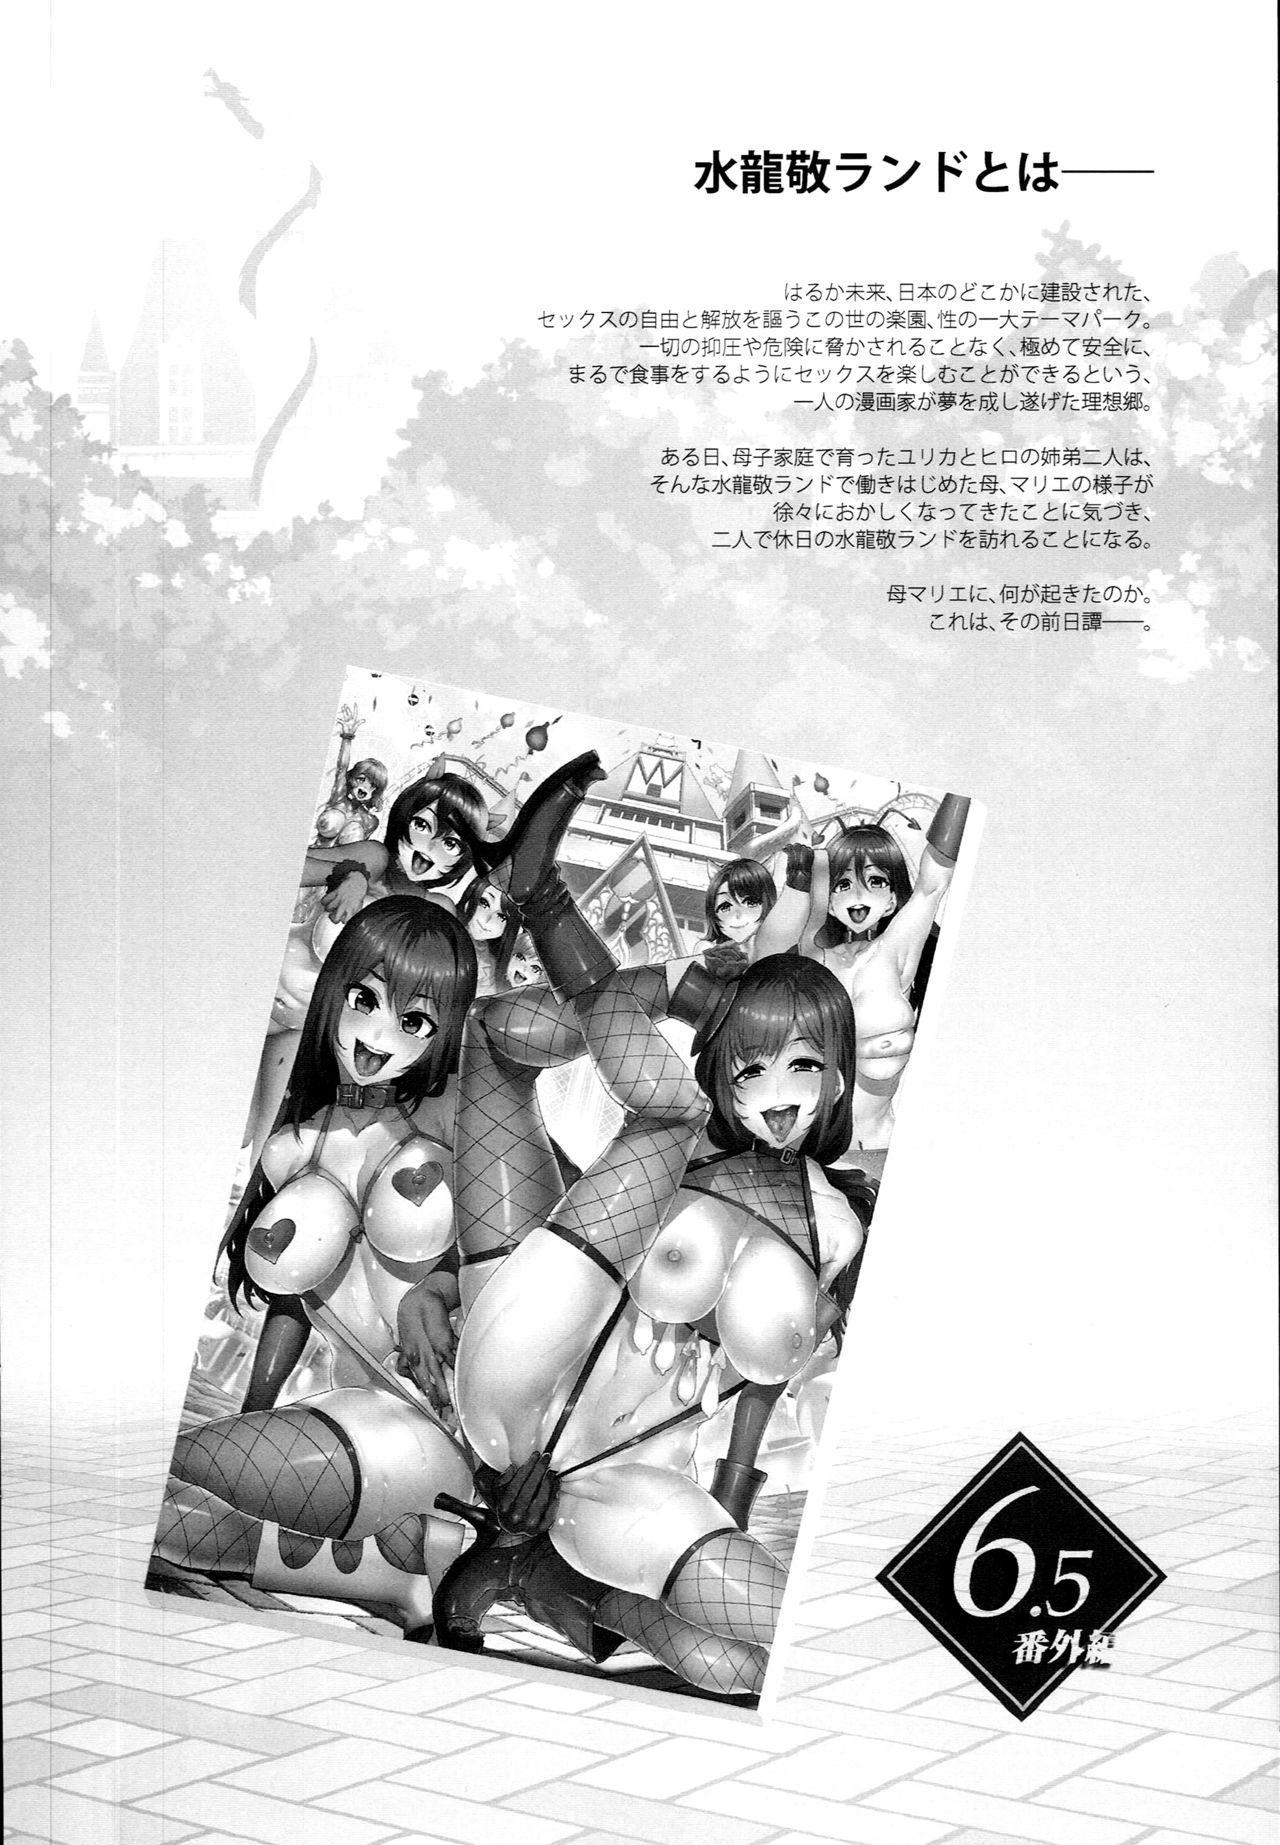 Oideyo! Mizuryu Kei Land the 6.5 Bangaihen - Kazoku to Sukebe na Theme Park! 4